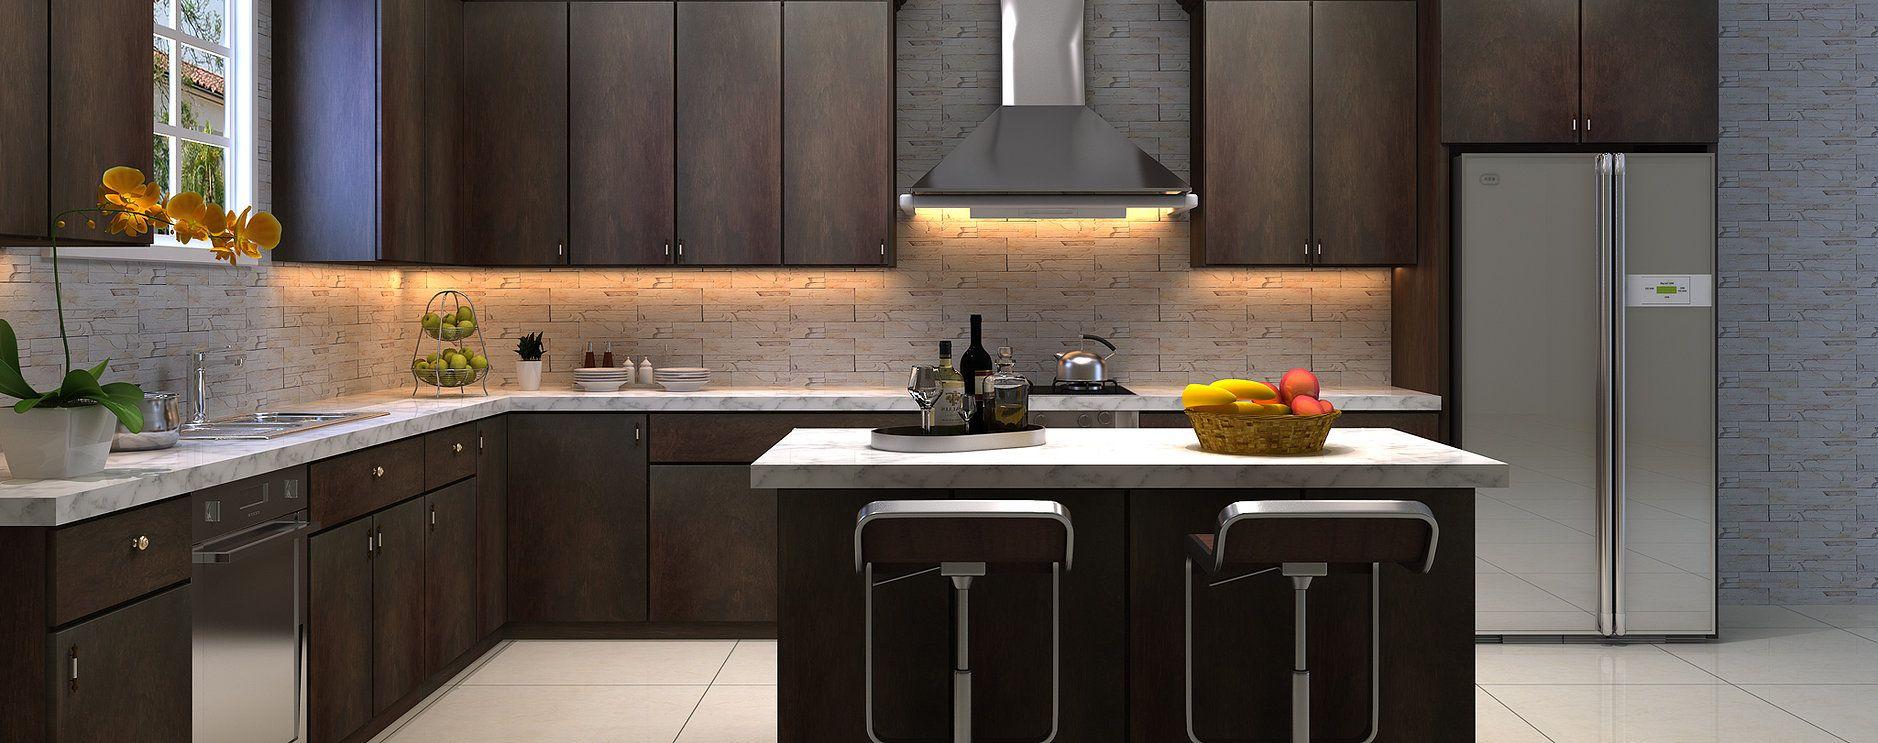 Procraft Cabinetry Semi Custom Kitchen Cabinets Kitchen